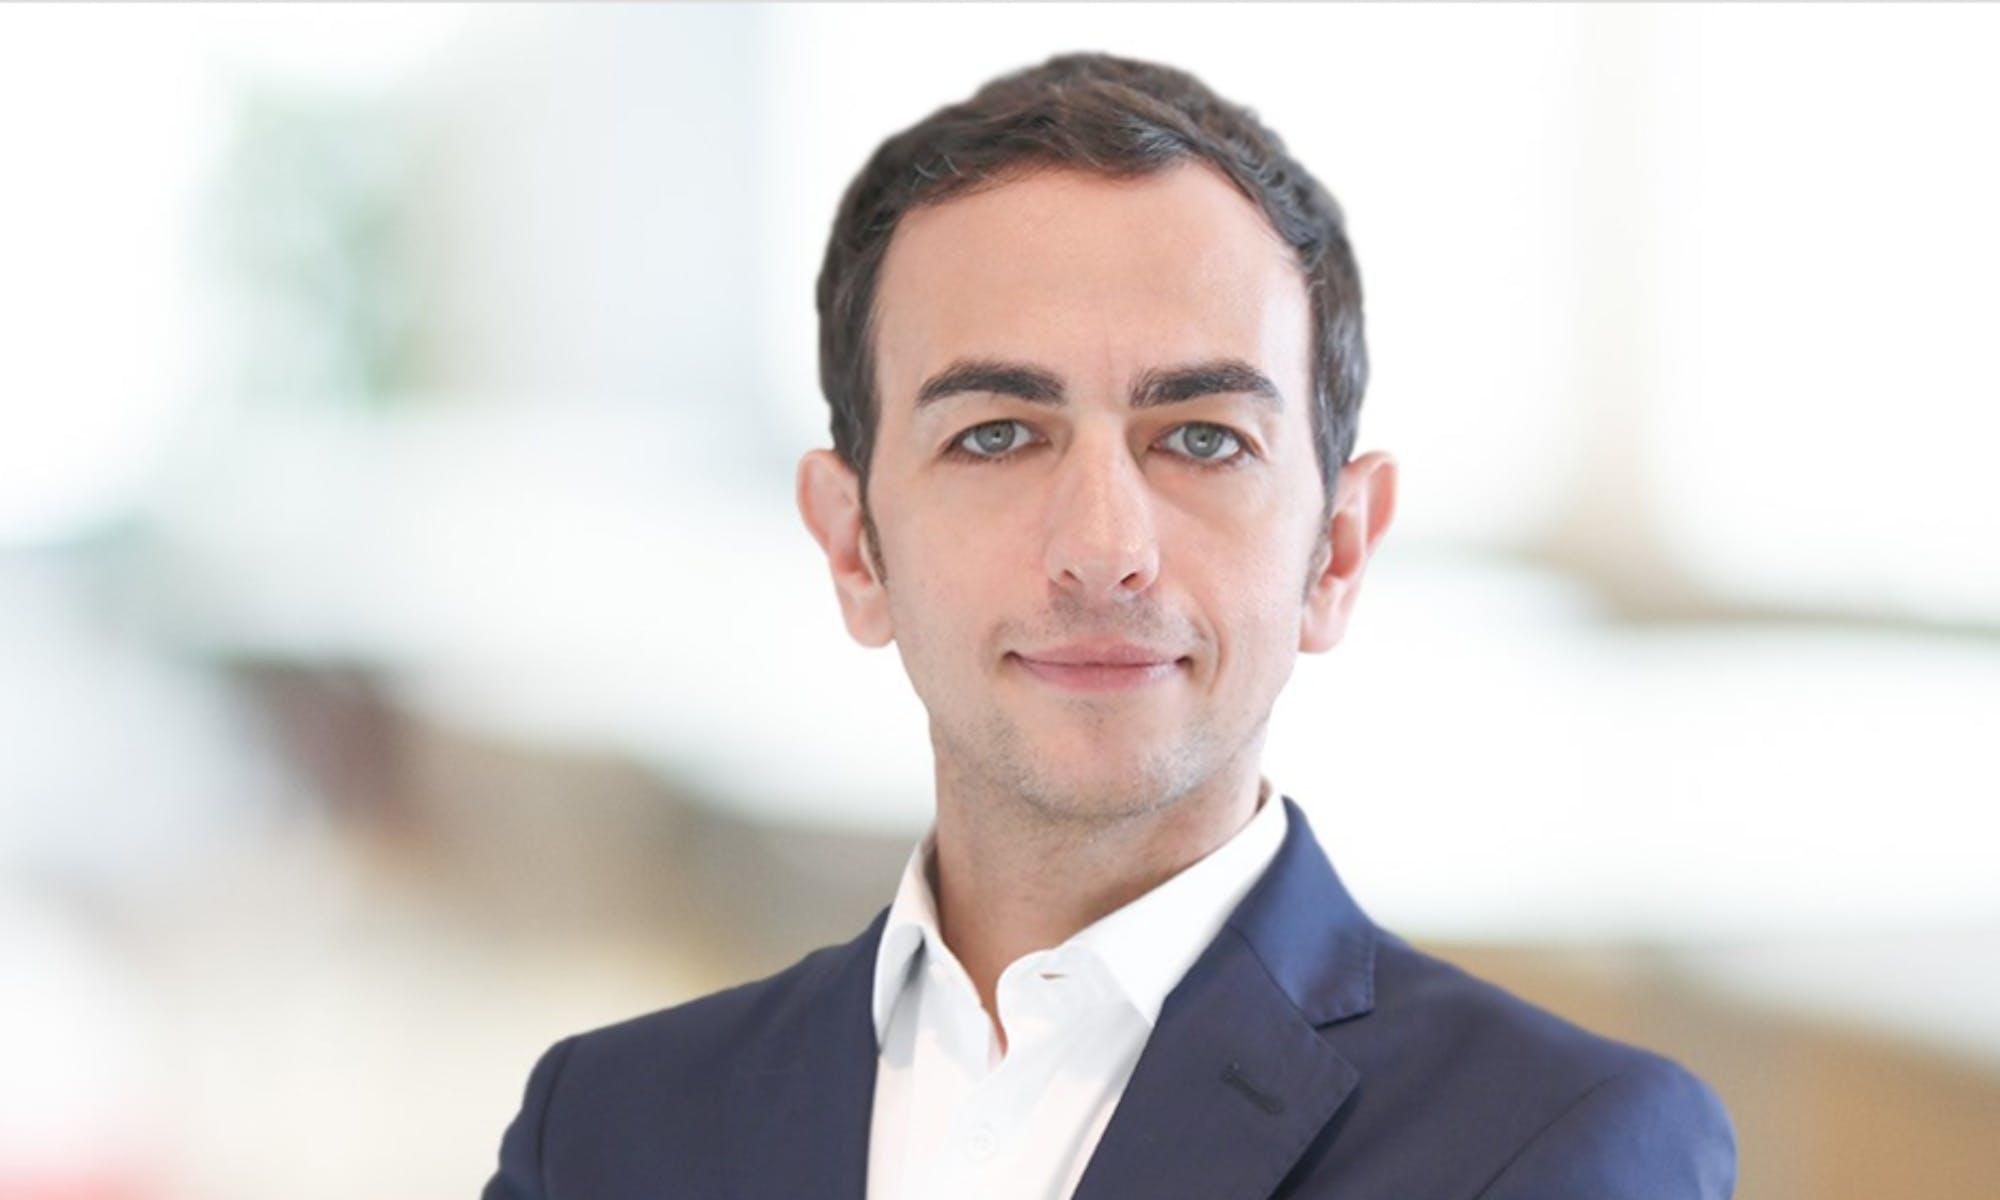 Spotlight on the Speakers  Fabio Colacchio, Associate Partner at Bain & Compan